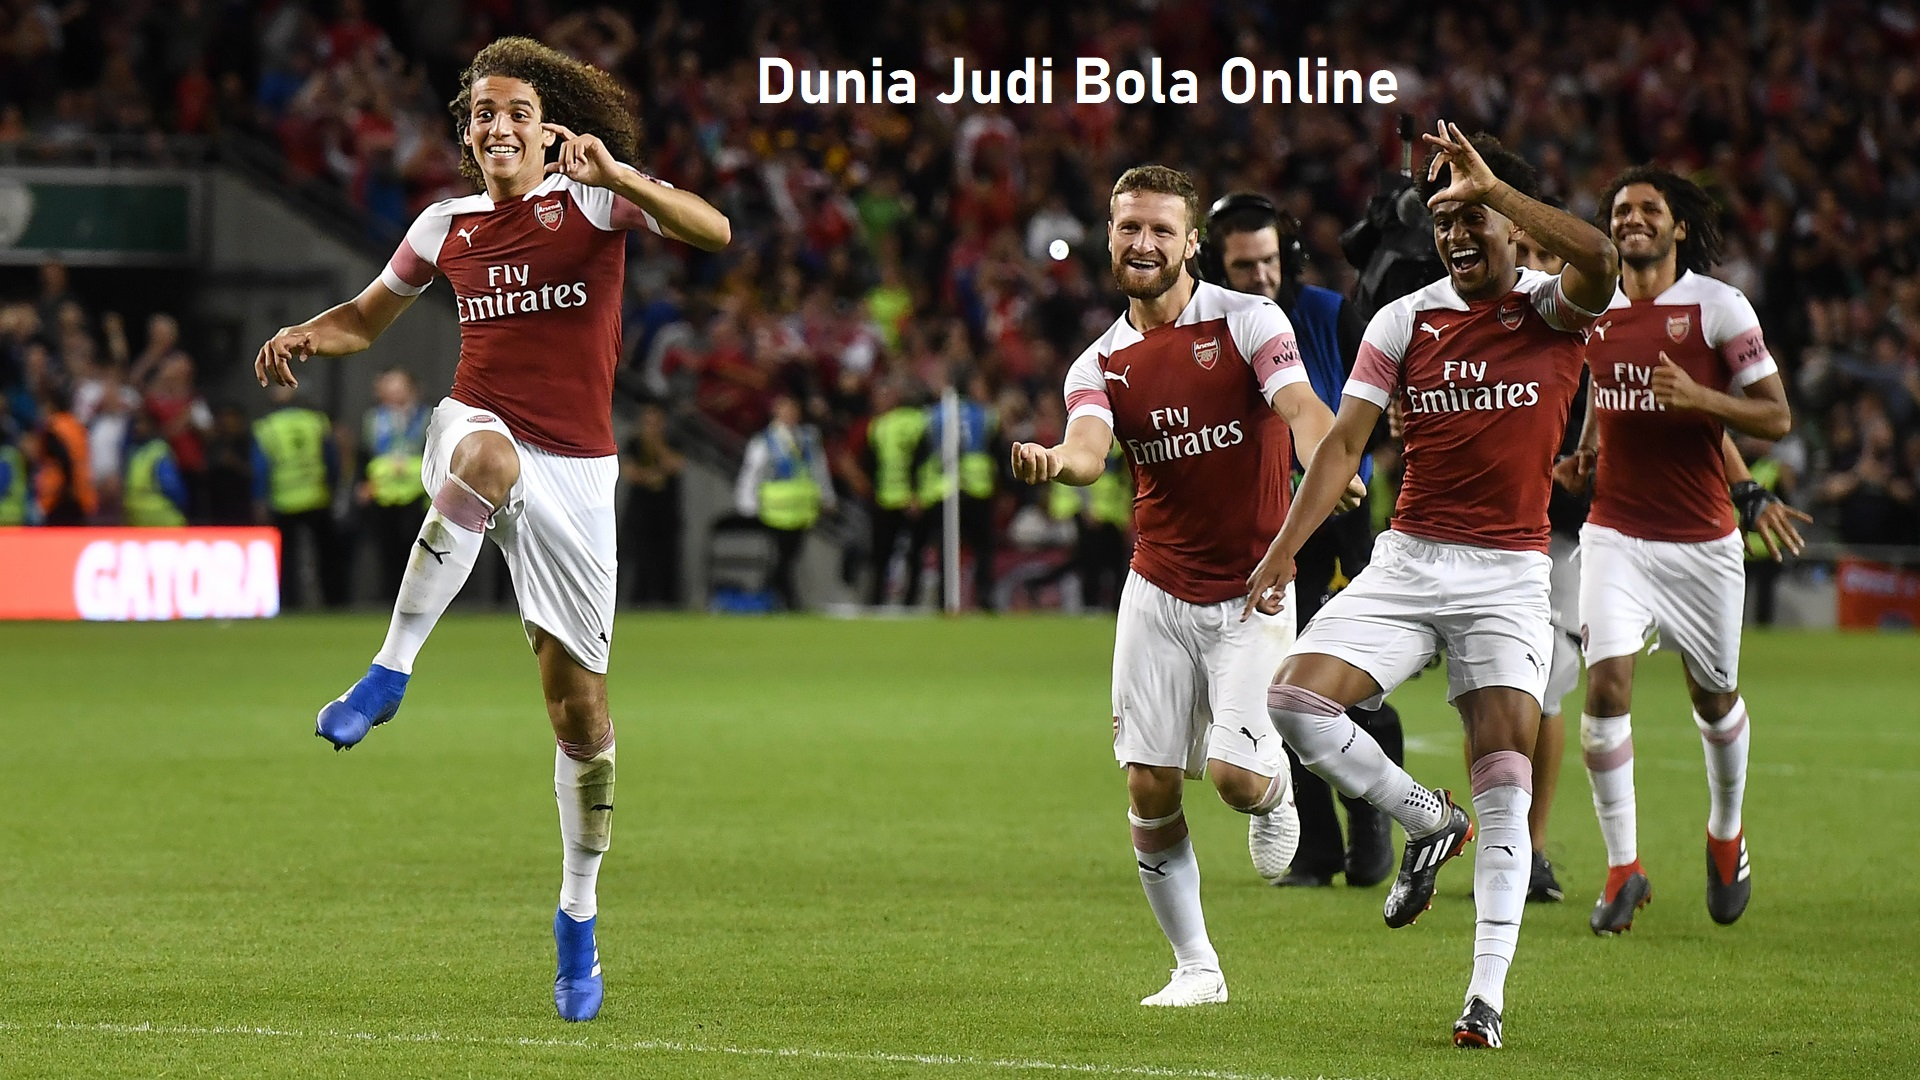 Dunia Judi Bola Online